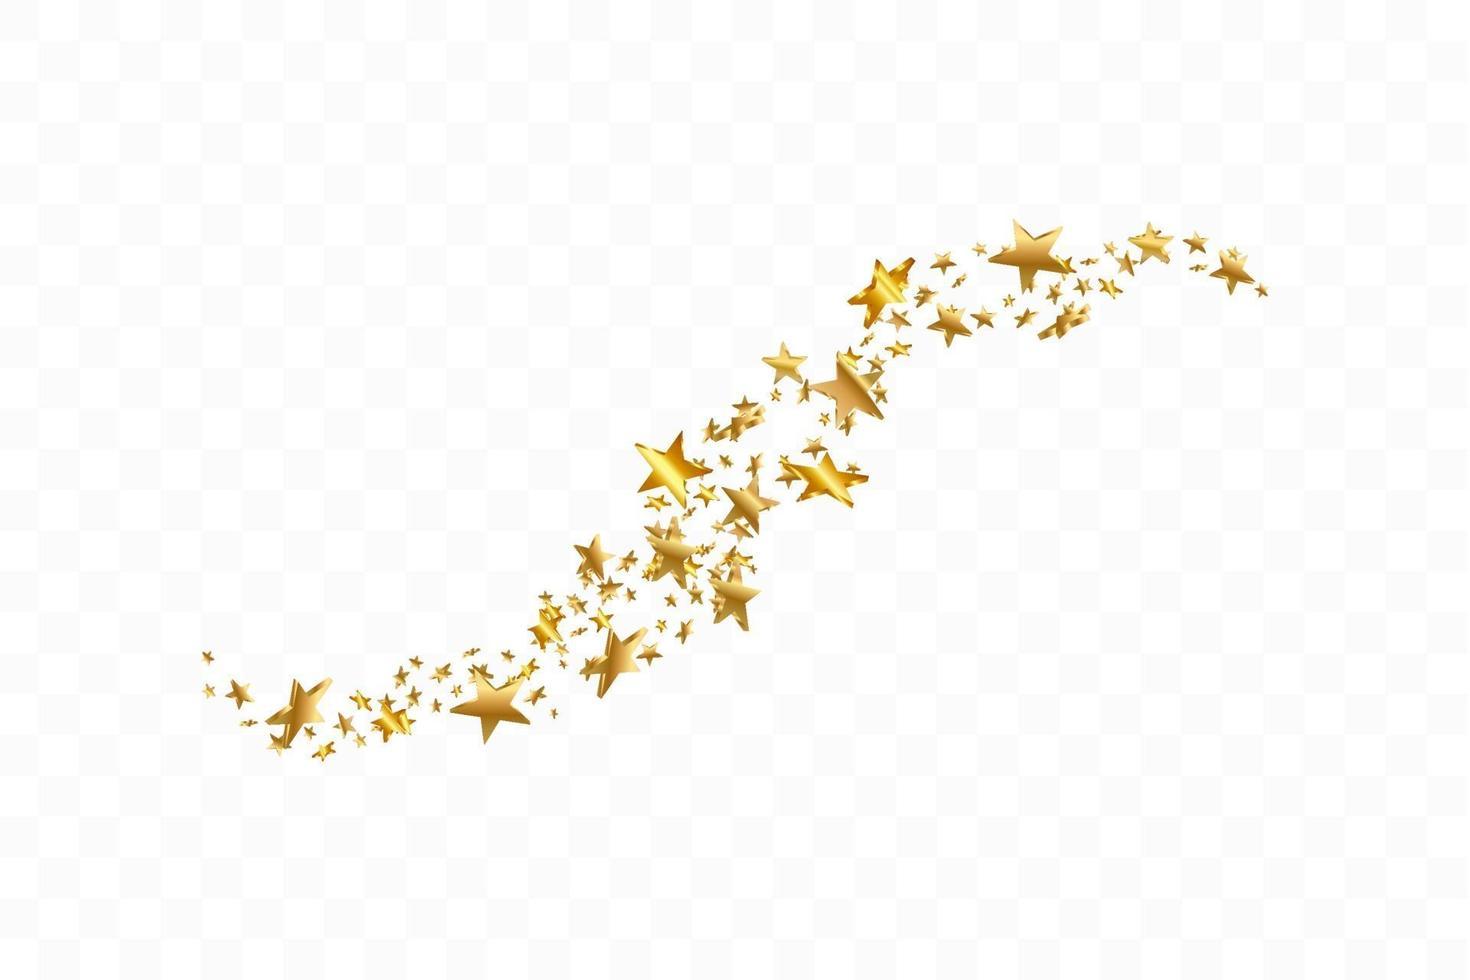 goudgeel 3d ster vallen. vector confetti ster achtergrond. gouden sterrenkaart. confetti vallen chaotisch decor.